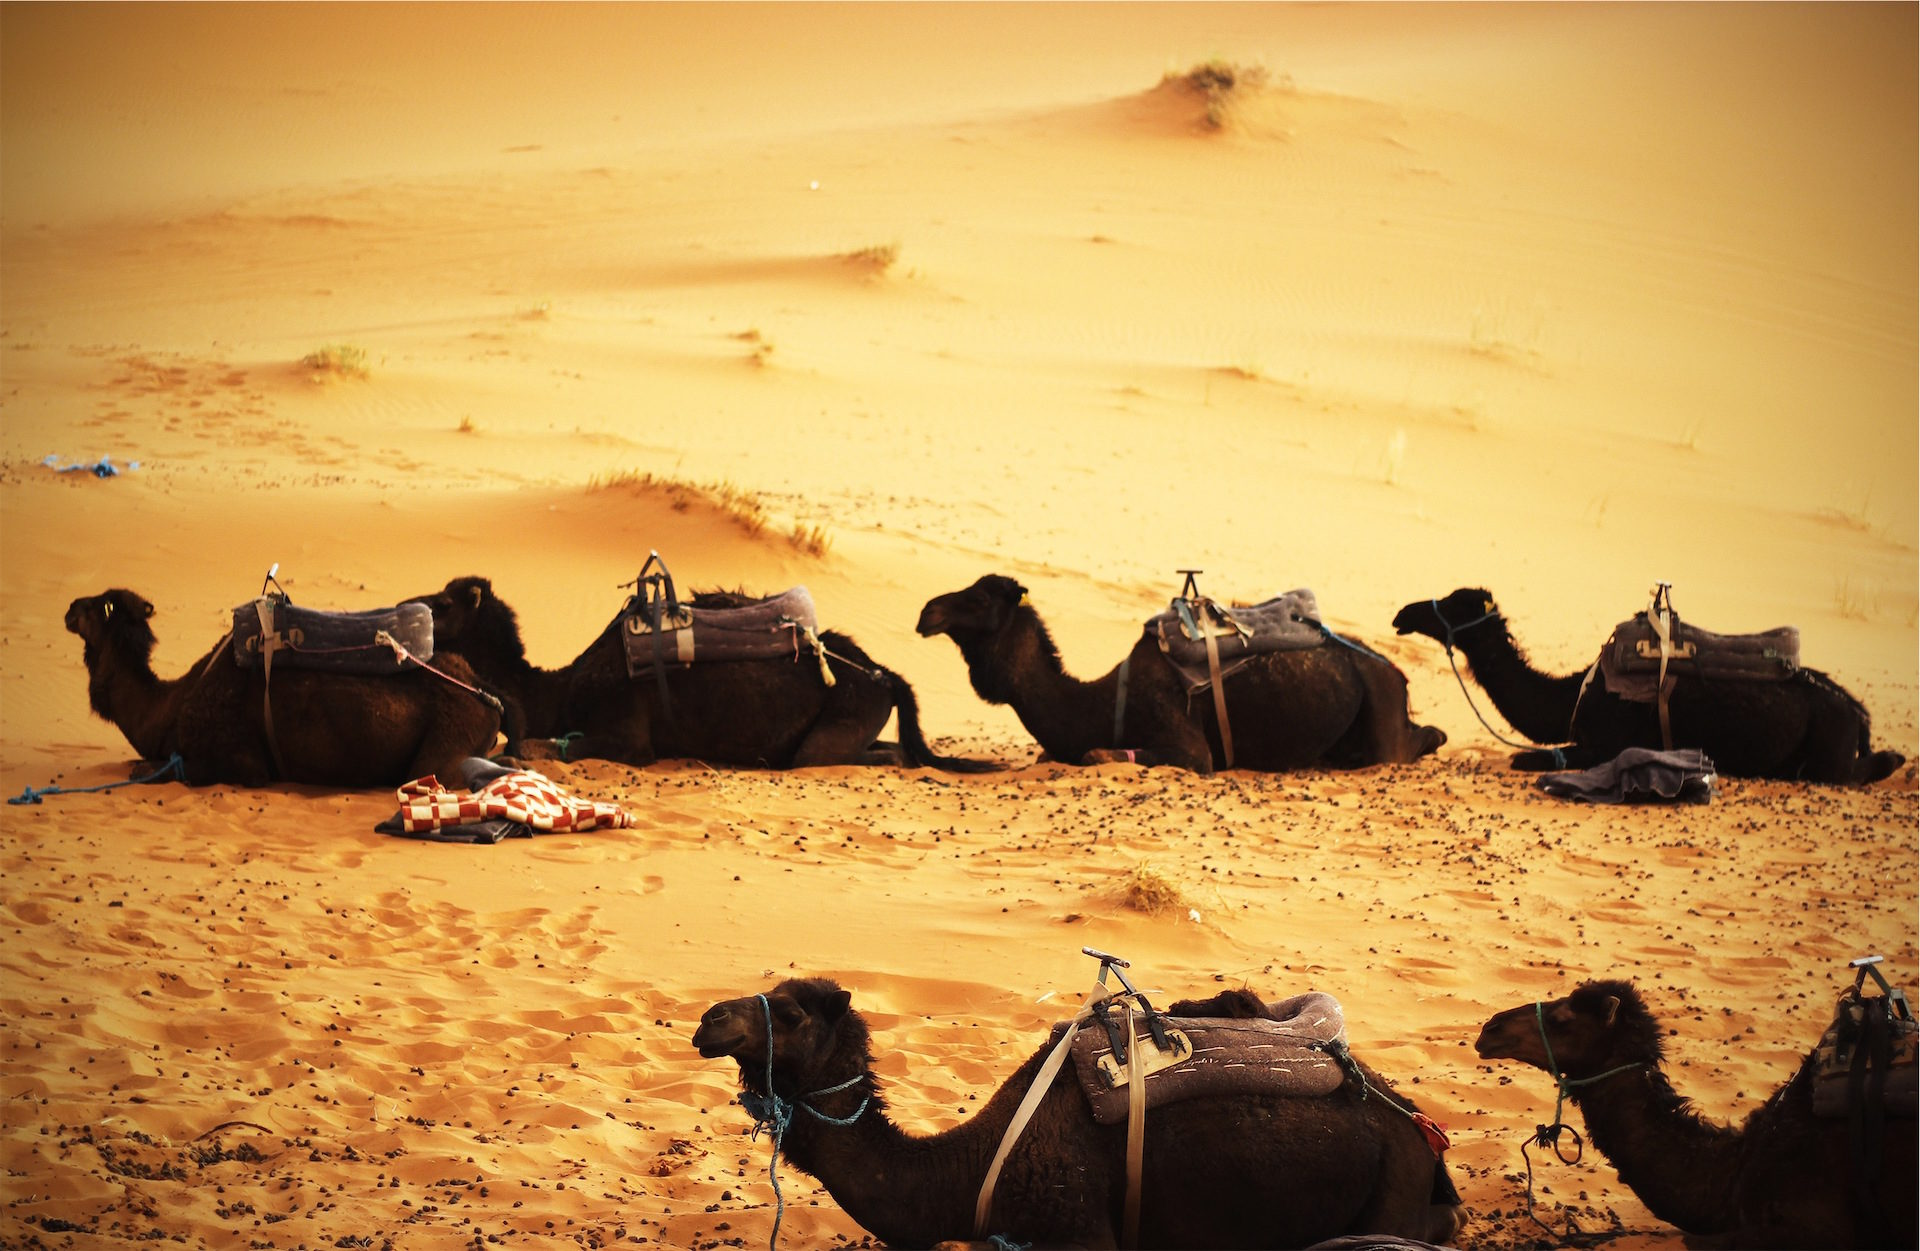 ऊंट, desiertos, dromedarios, रेत, inhóspito - HD वॉलपेपर - प्रोफेसर-falken.com